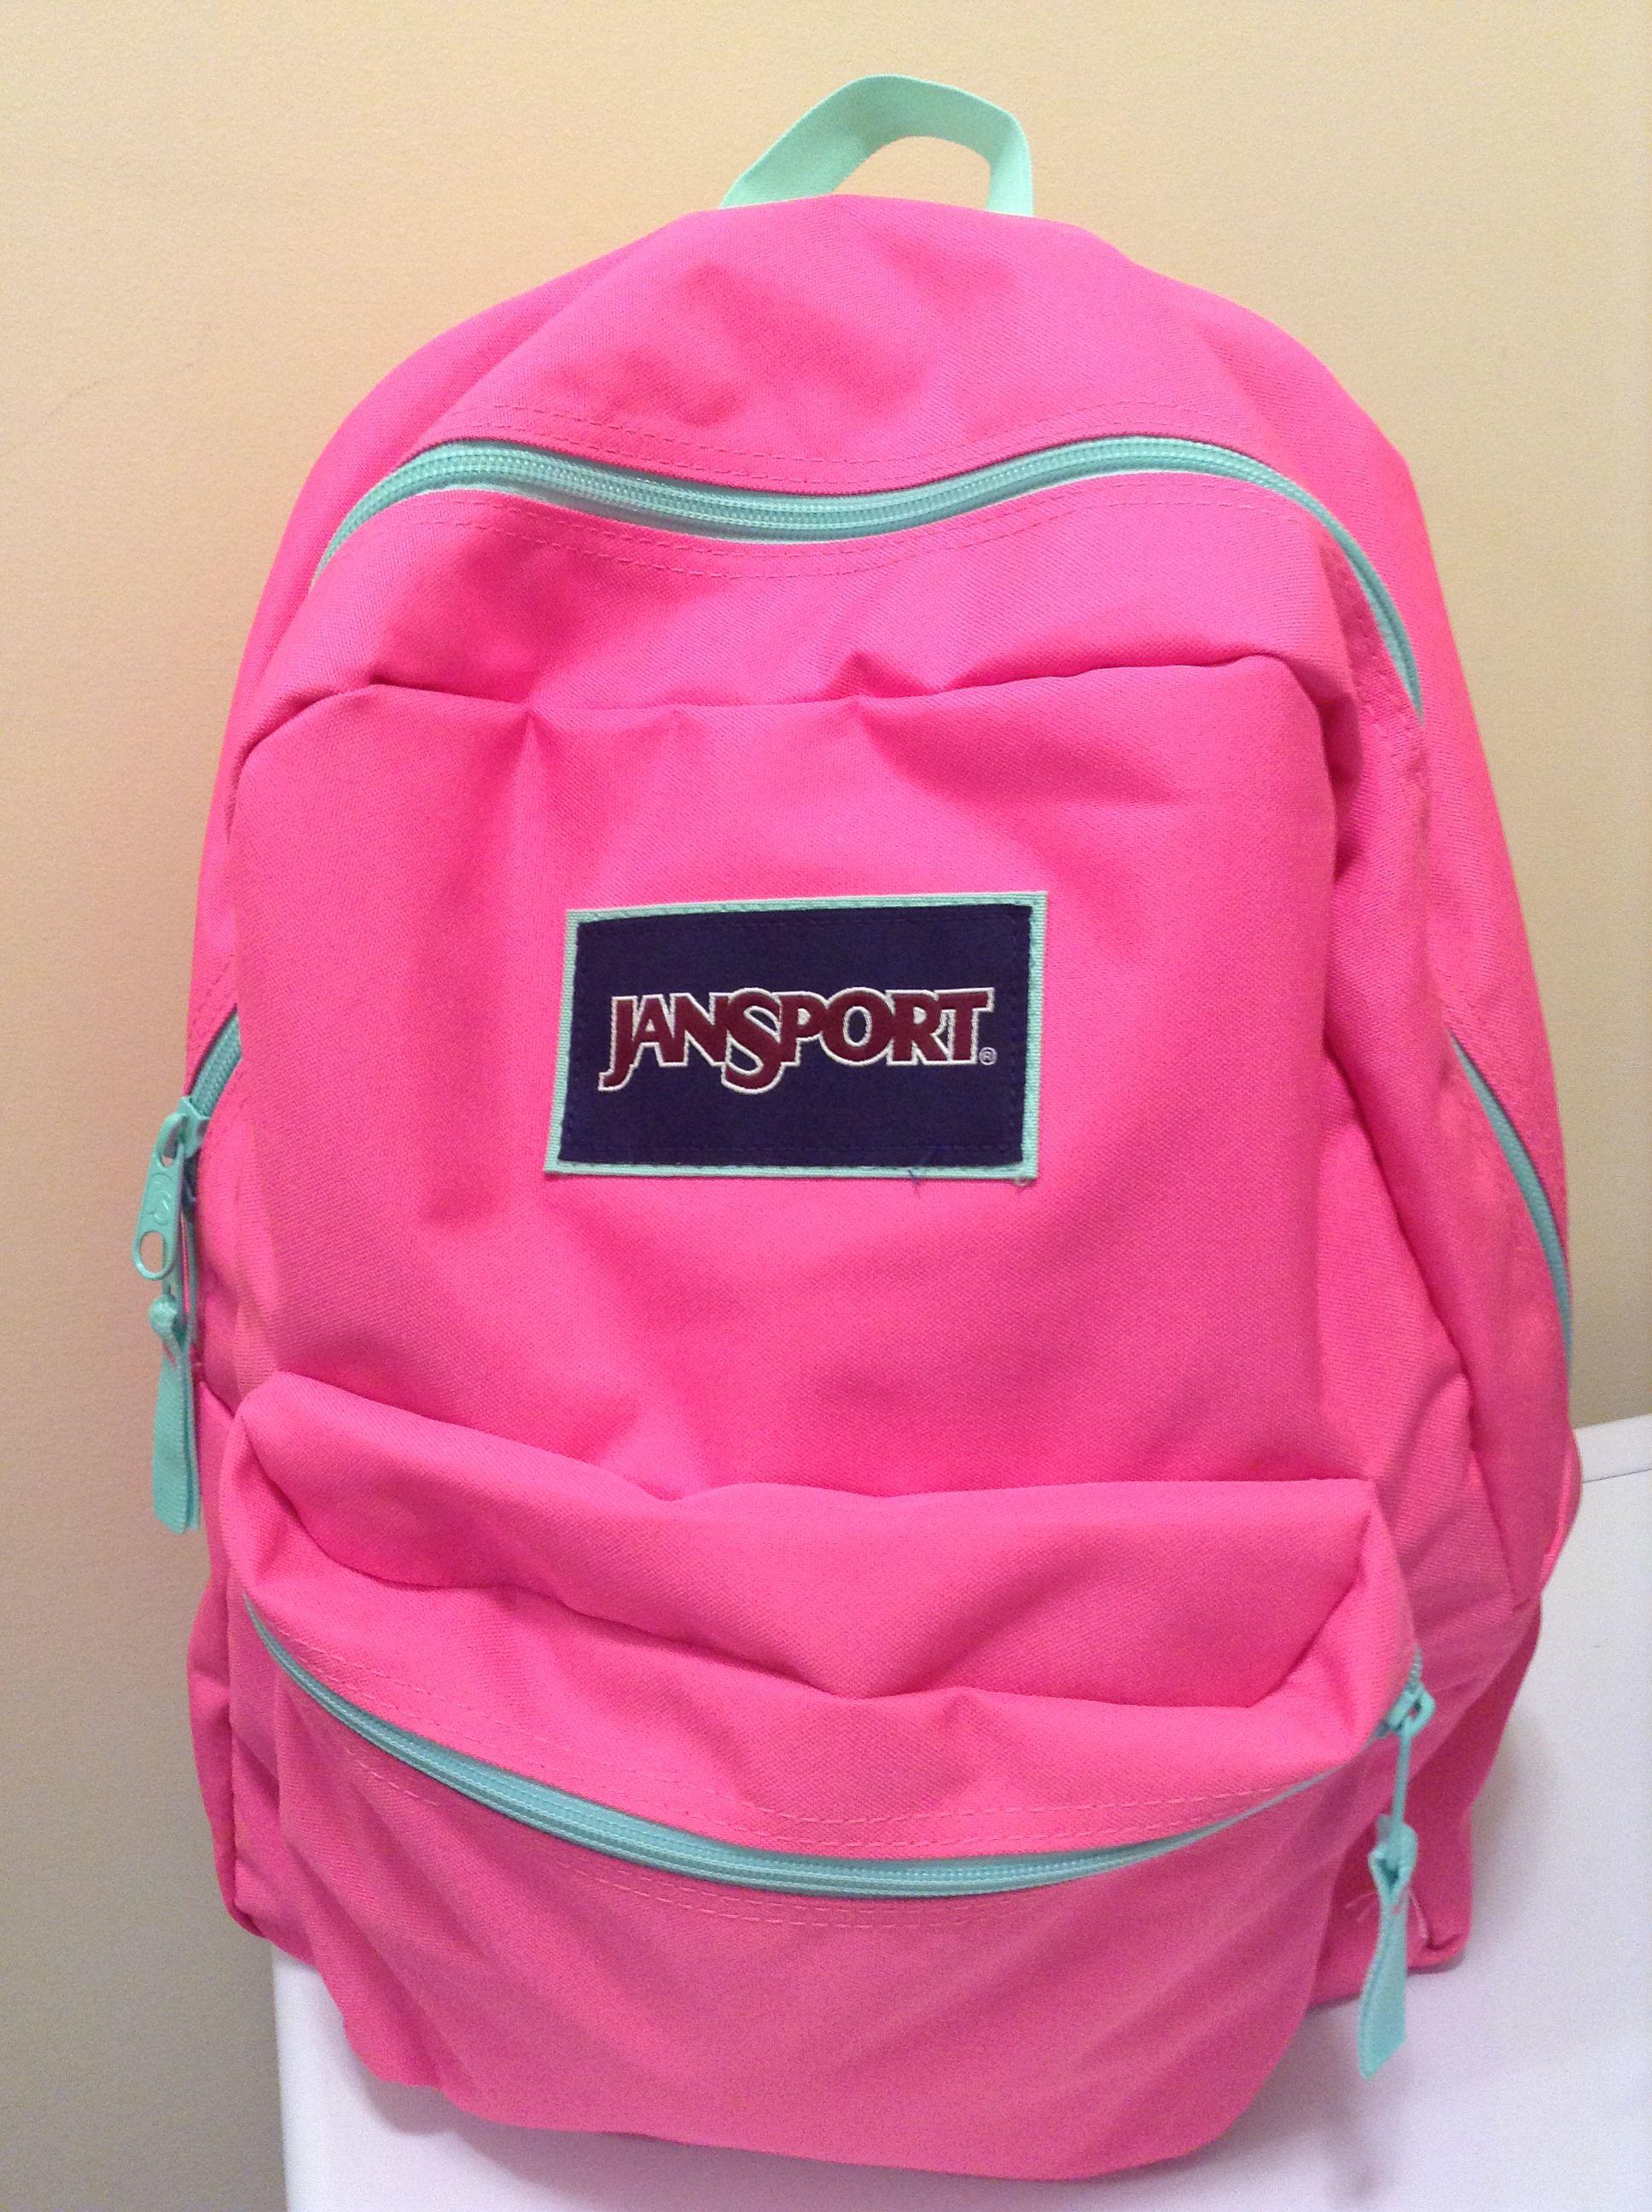 New hot pink backpack.  jansport  2e9ea7b198c59